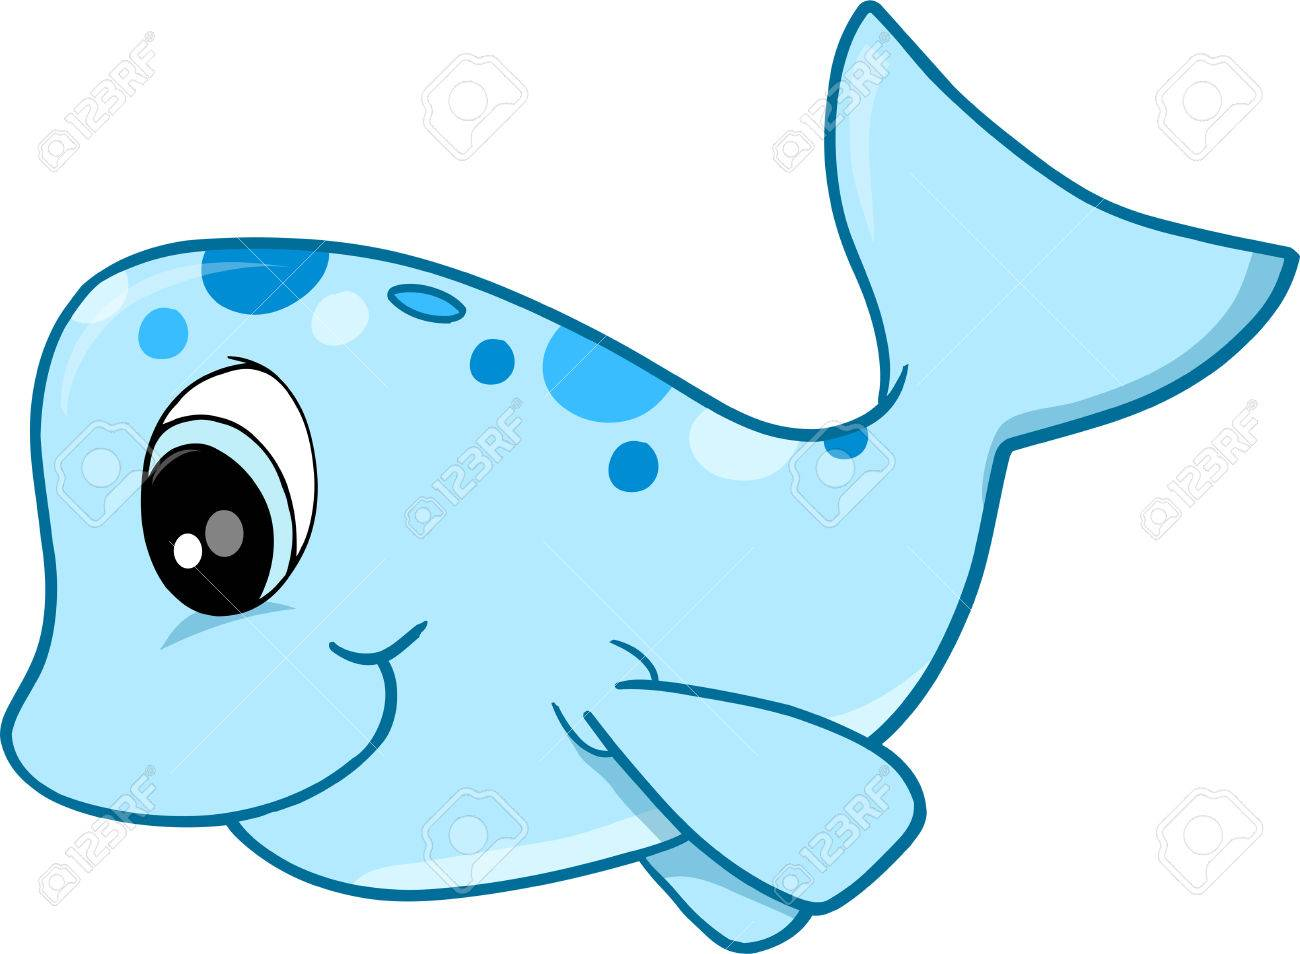 Cute Whale Vector Illustration Stock Vector - 2490928